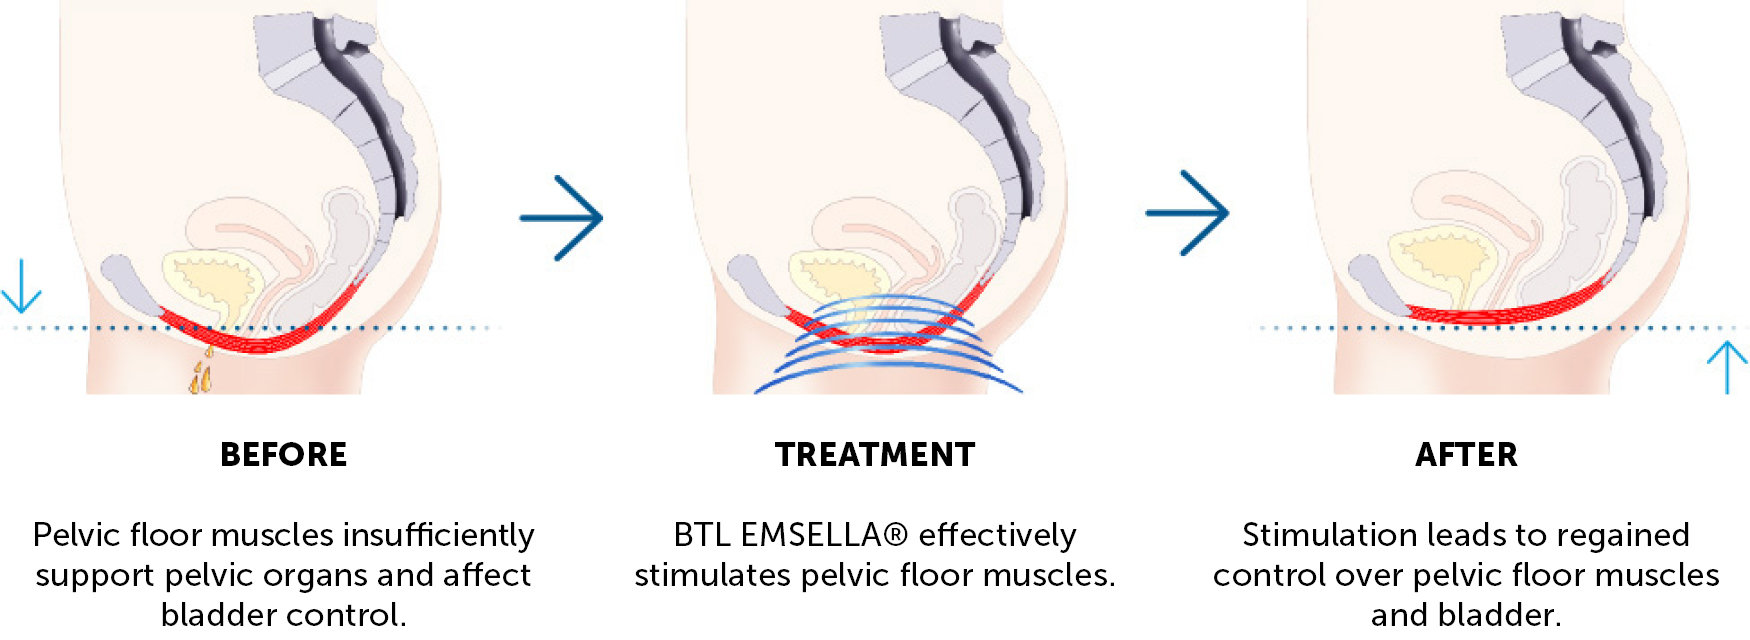 Emsella Incontinence Treatment Results CJA Aesthetics Hampshire